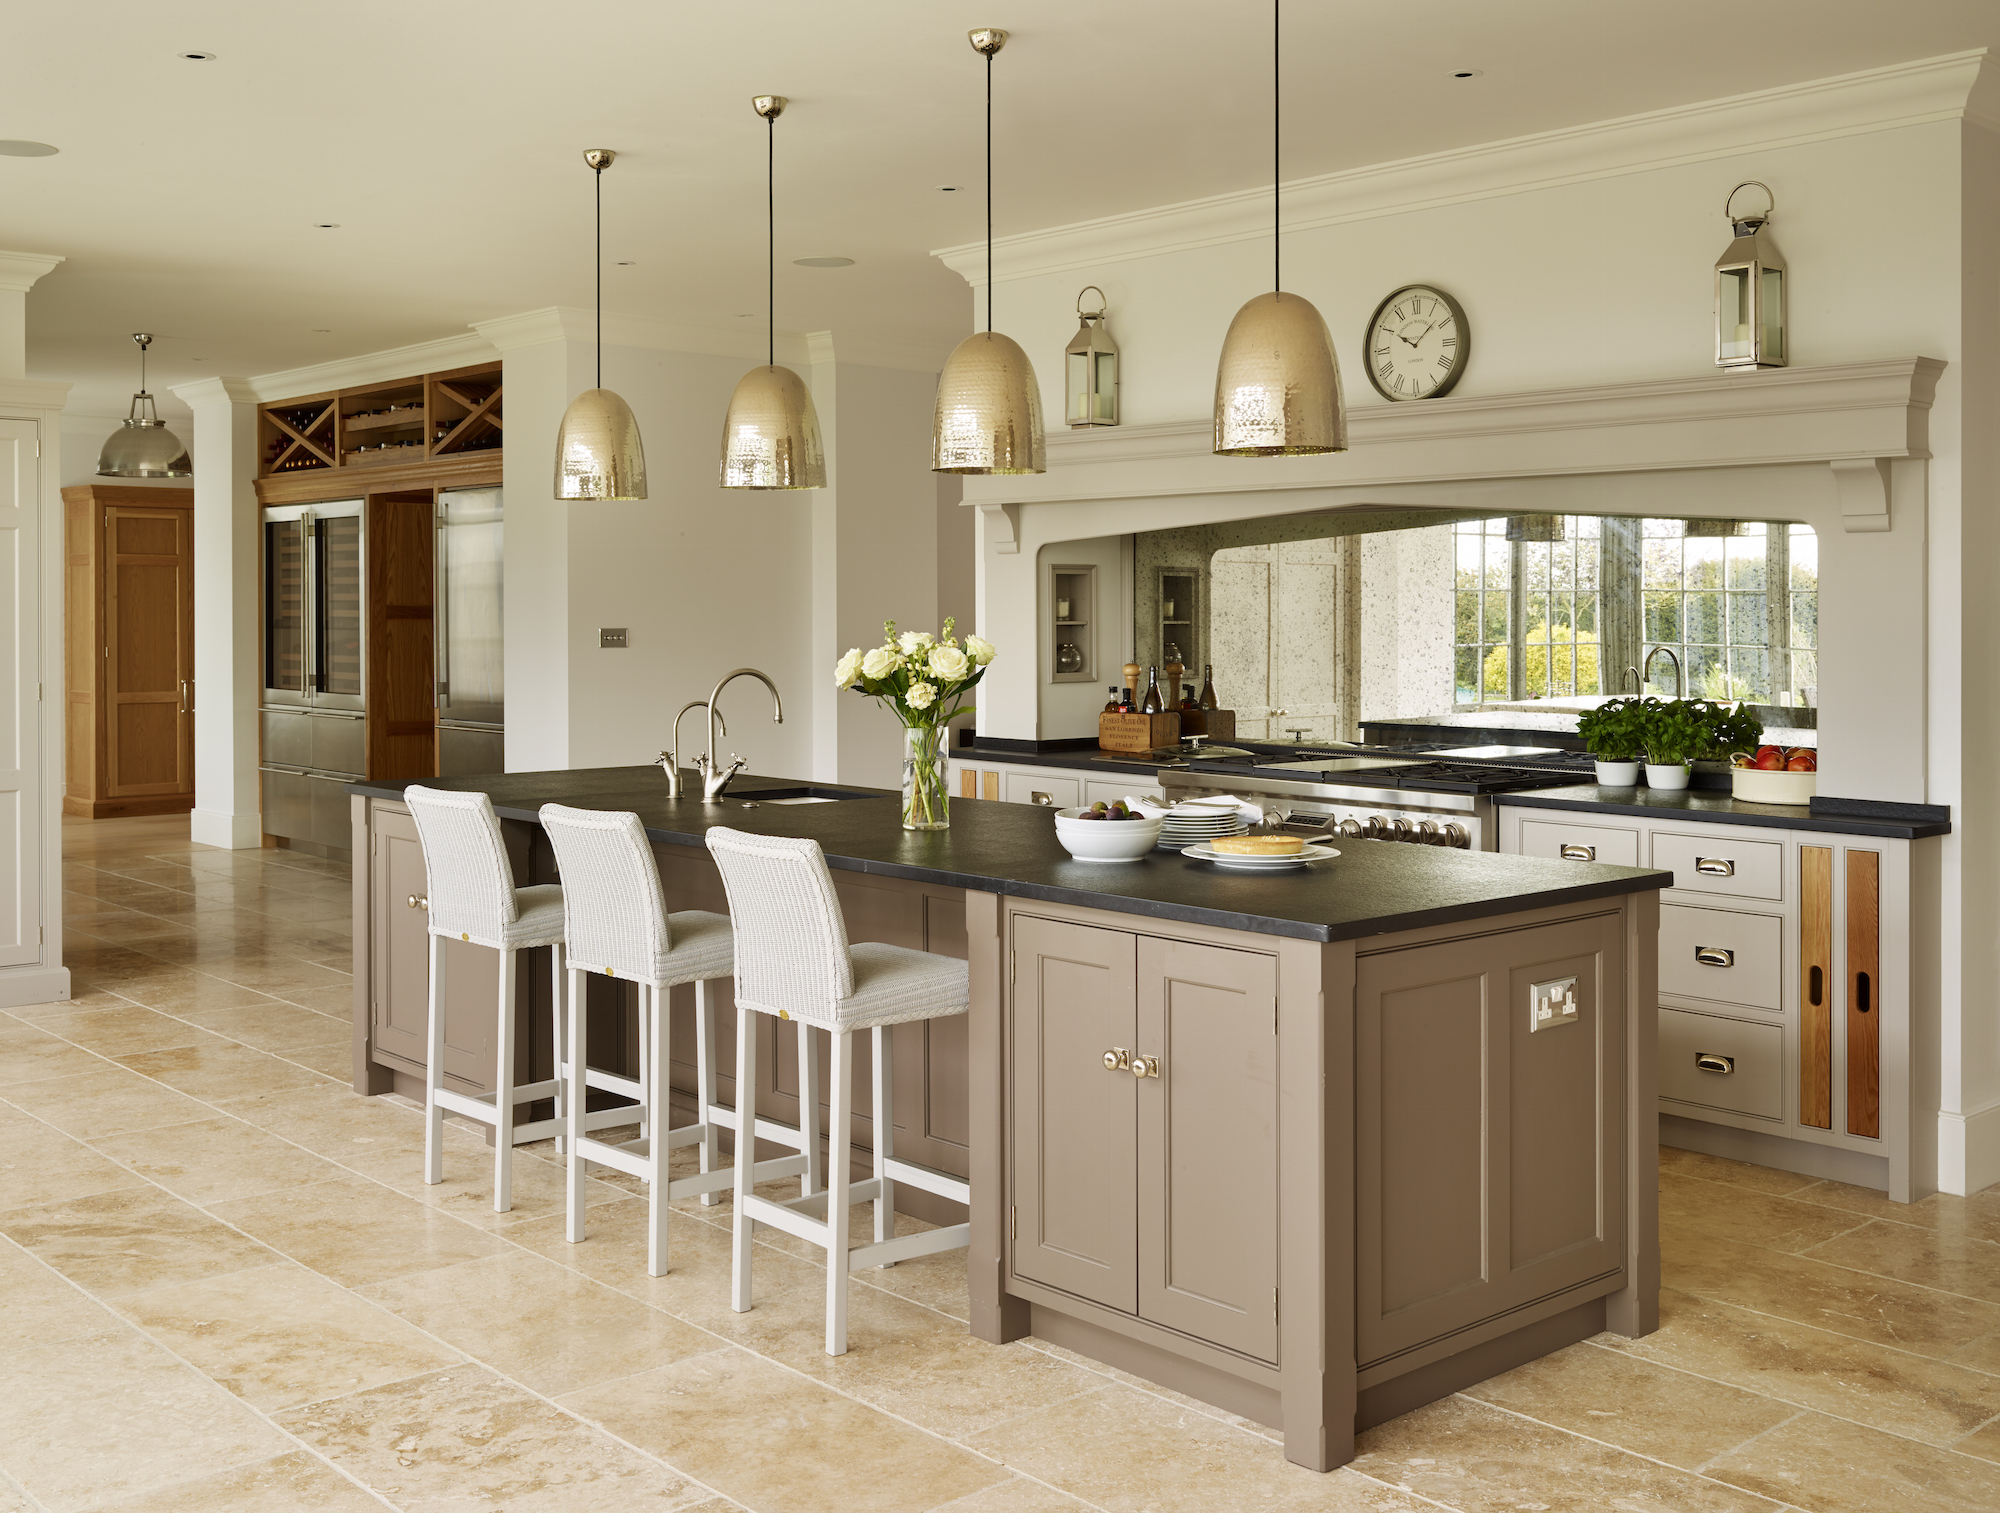 kitchen designs pictures design ideas photo - 6